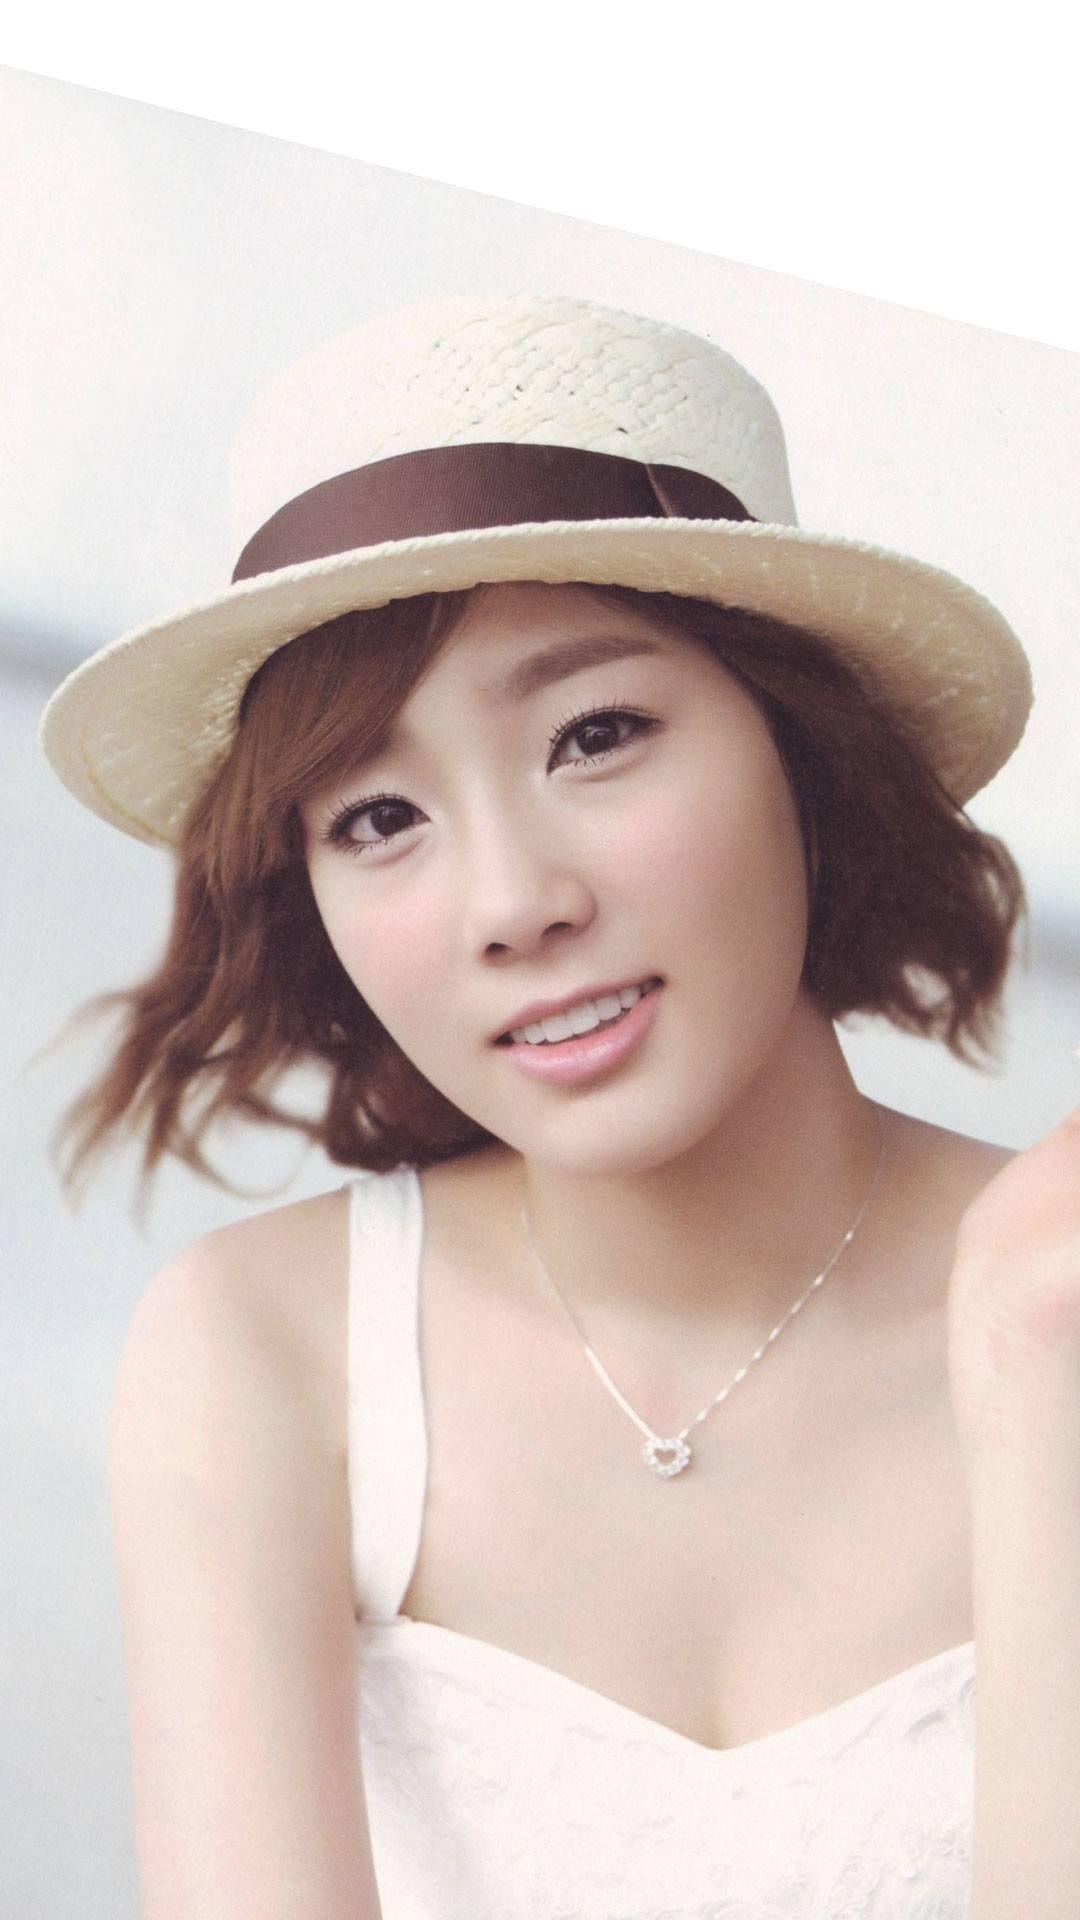 Iphone 6 wallpaper tumblr kpop - Kim Taeyeon Wallpaper For Iphone 6 Hd Kpop Pinterest